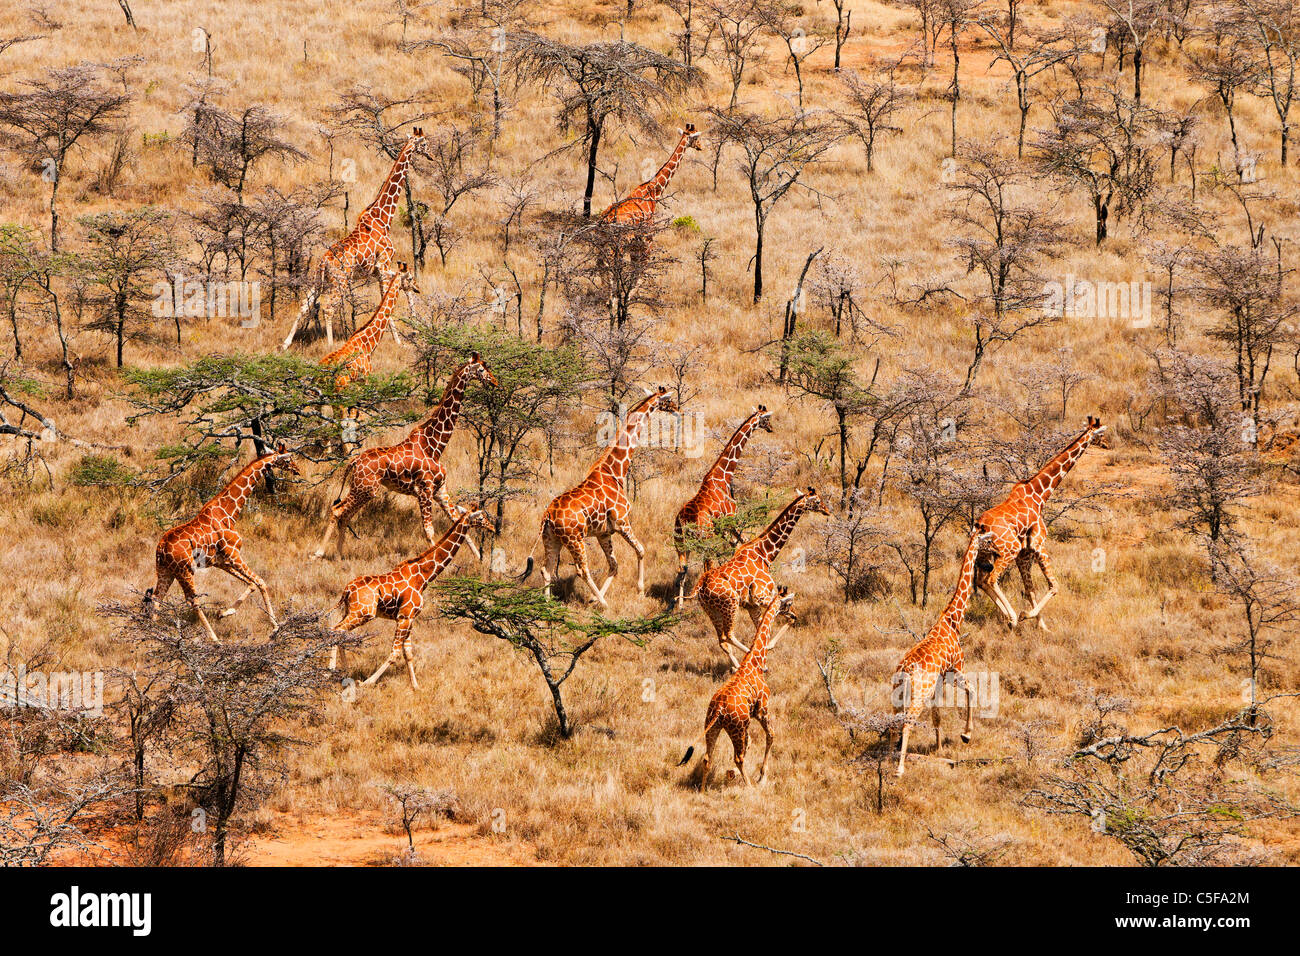 Vista aérea de la jirafa reticulada (Giraffa camelopardalis reticulata) en Kenia. Foto de stock